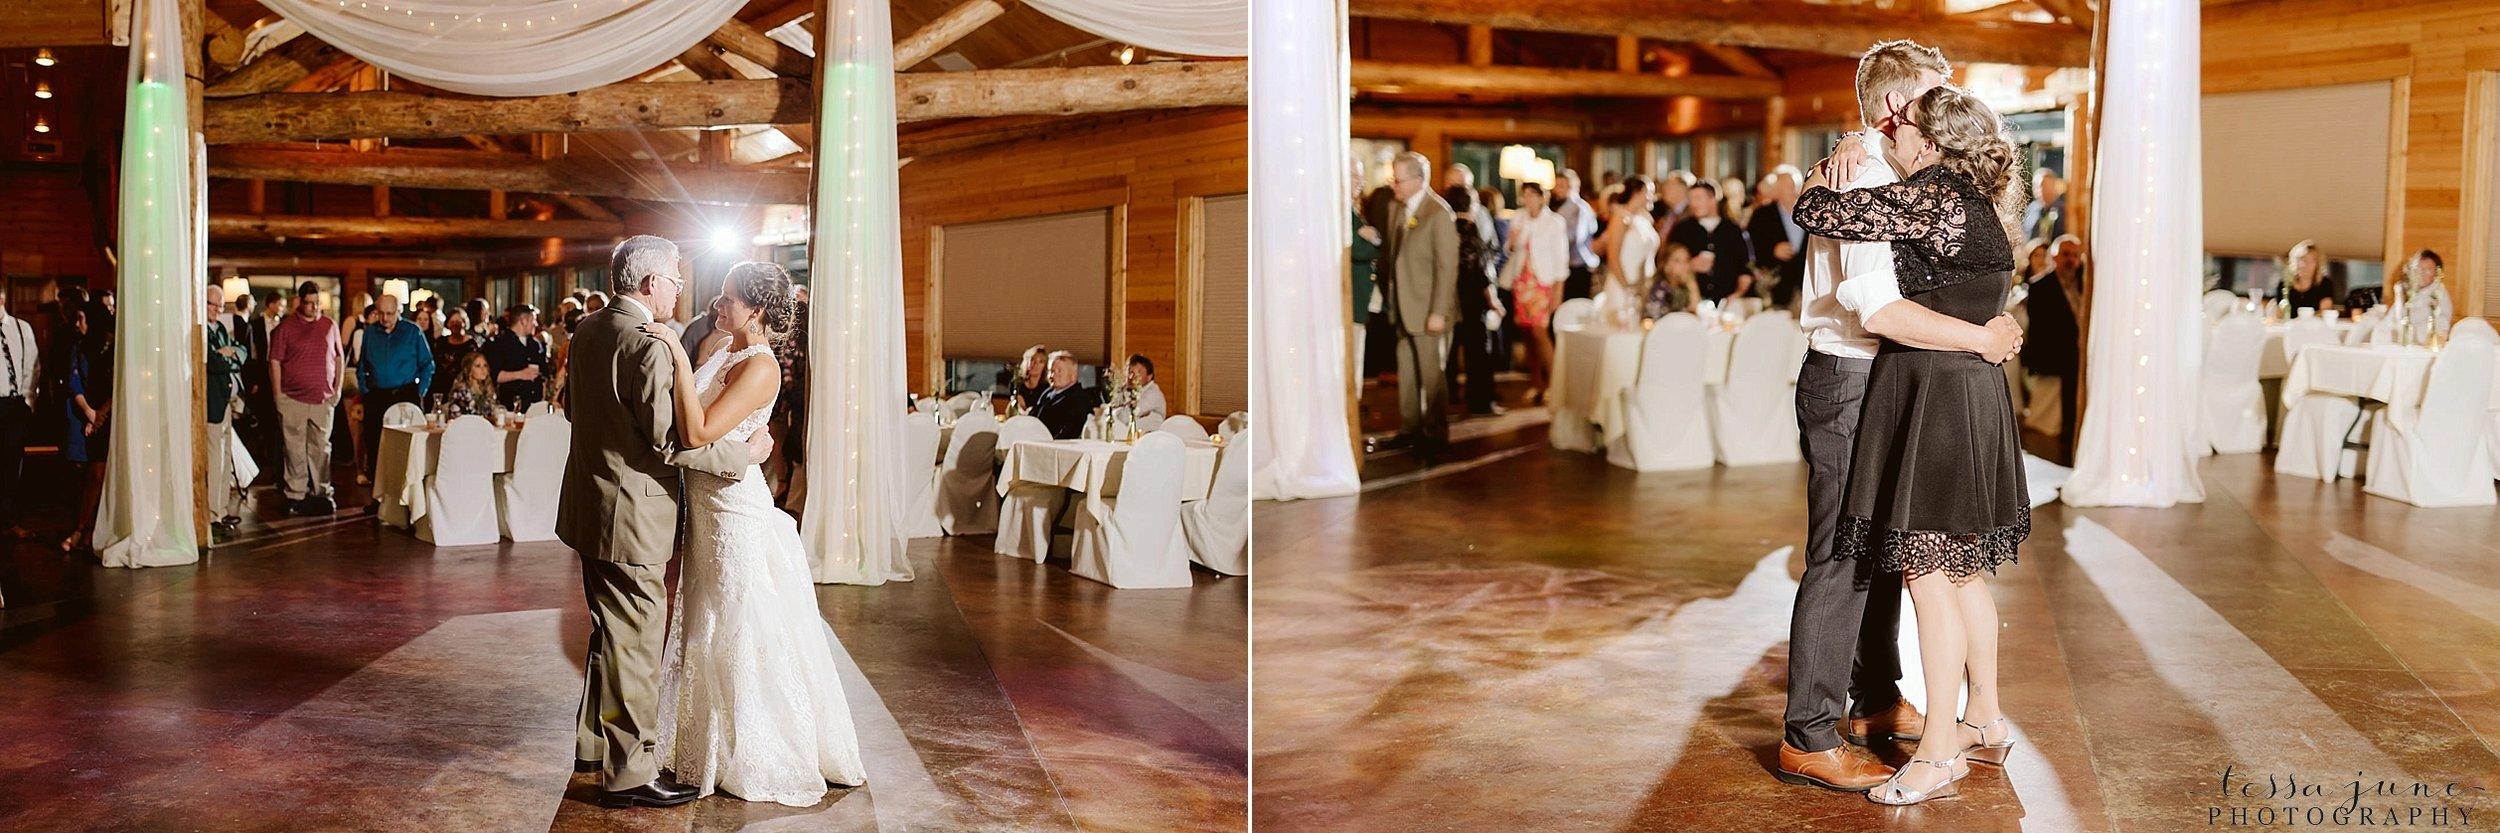 The-grands-at-mulligans-wedding-sartell-minnesota-spring-floral-spring-garden-wedding-150.jpg